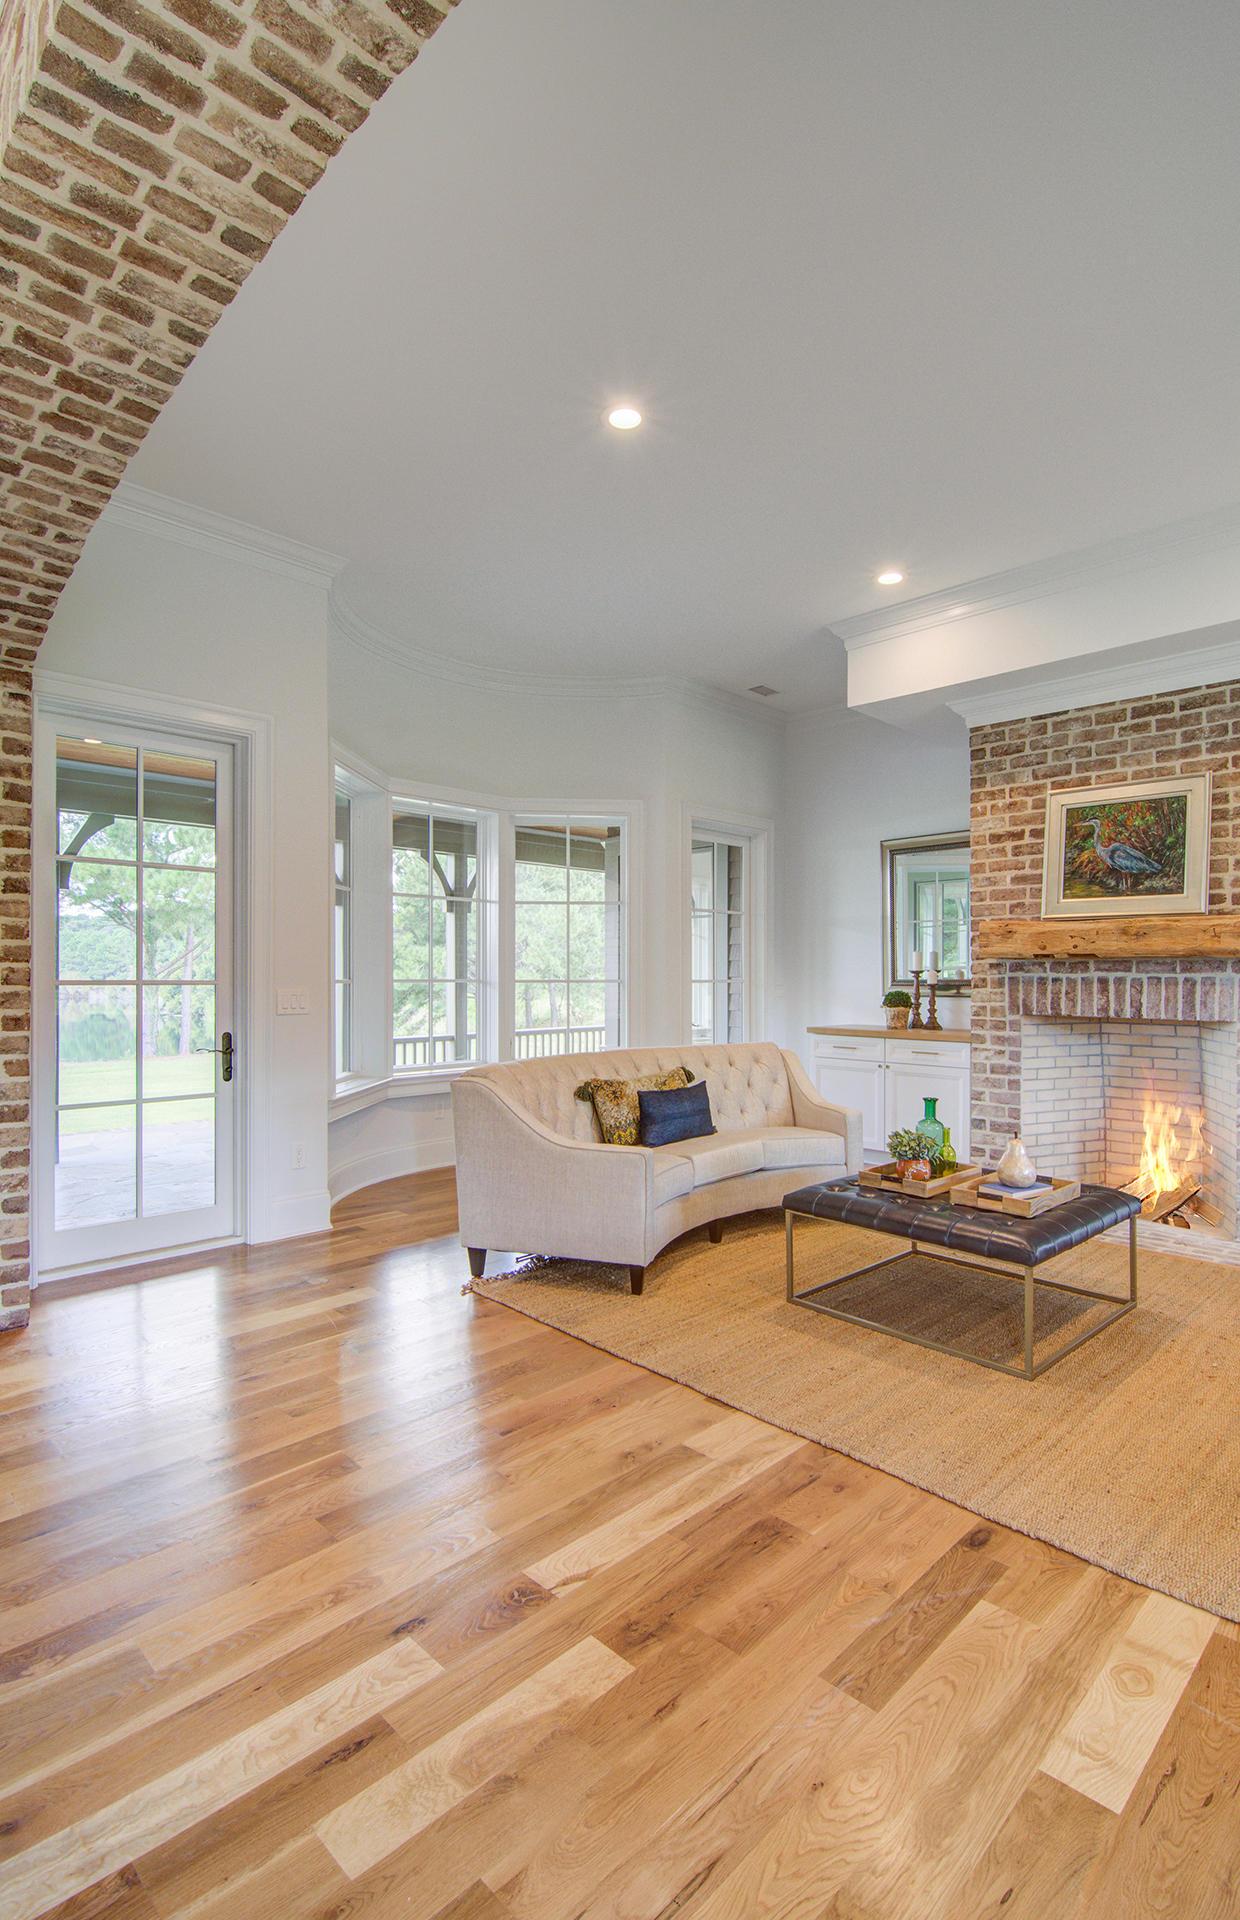 Briars Creek Homes For Sale - 3783 Gnarled Oaks, Johns Island, SC - 45